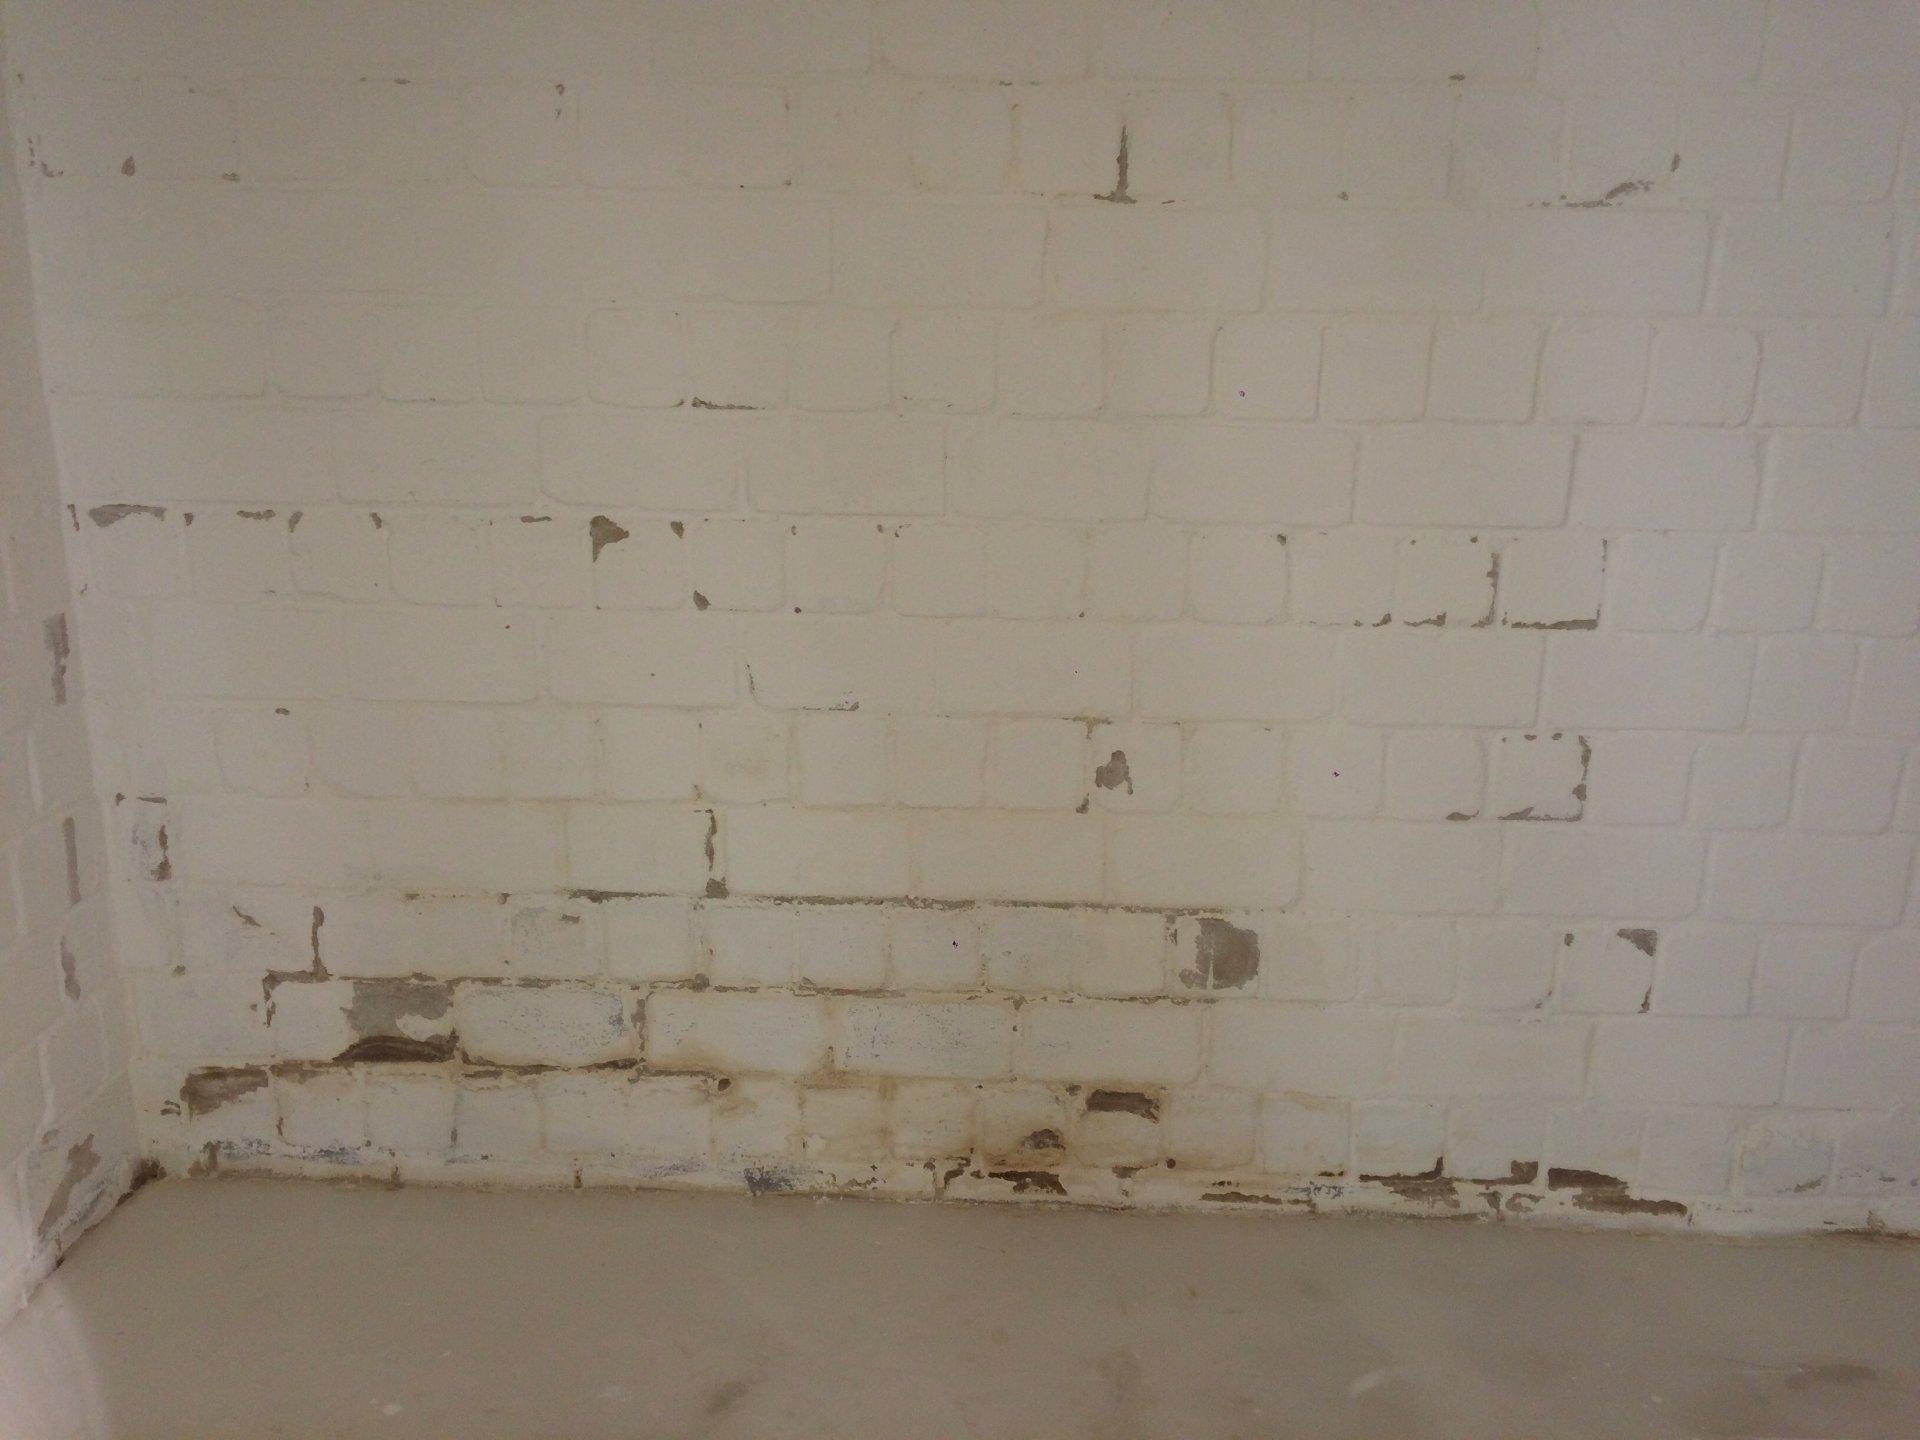 Top Braune Stellen an Kellerwand - Farbe bröckelt ab UV89